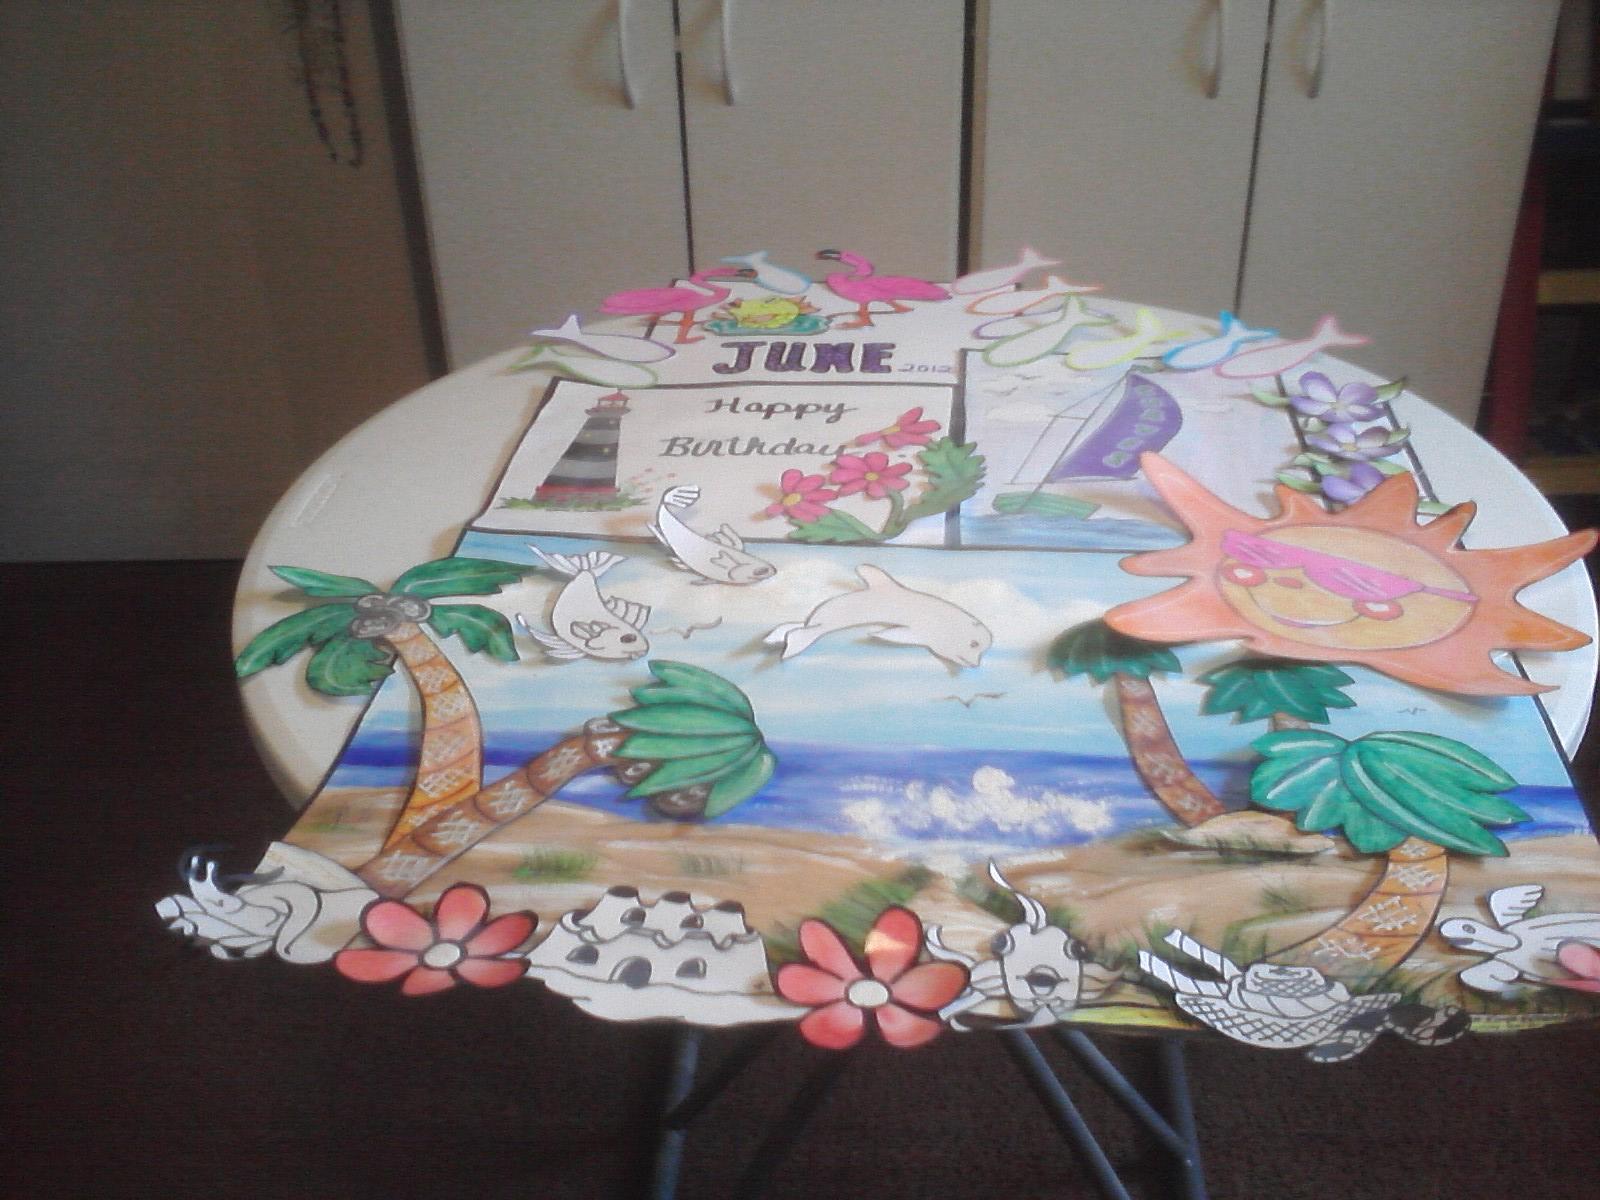 Artwork by Gloria Faye Brown Bates/aka Granny Gee